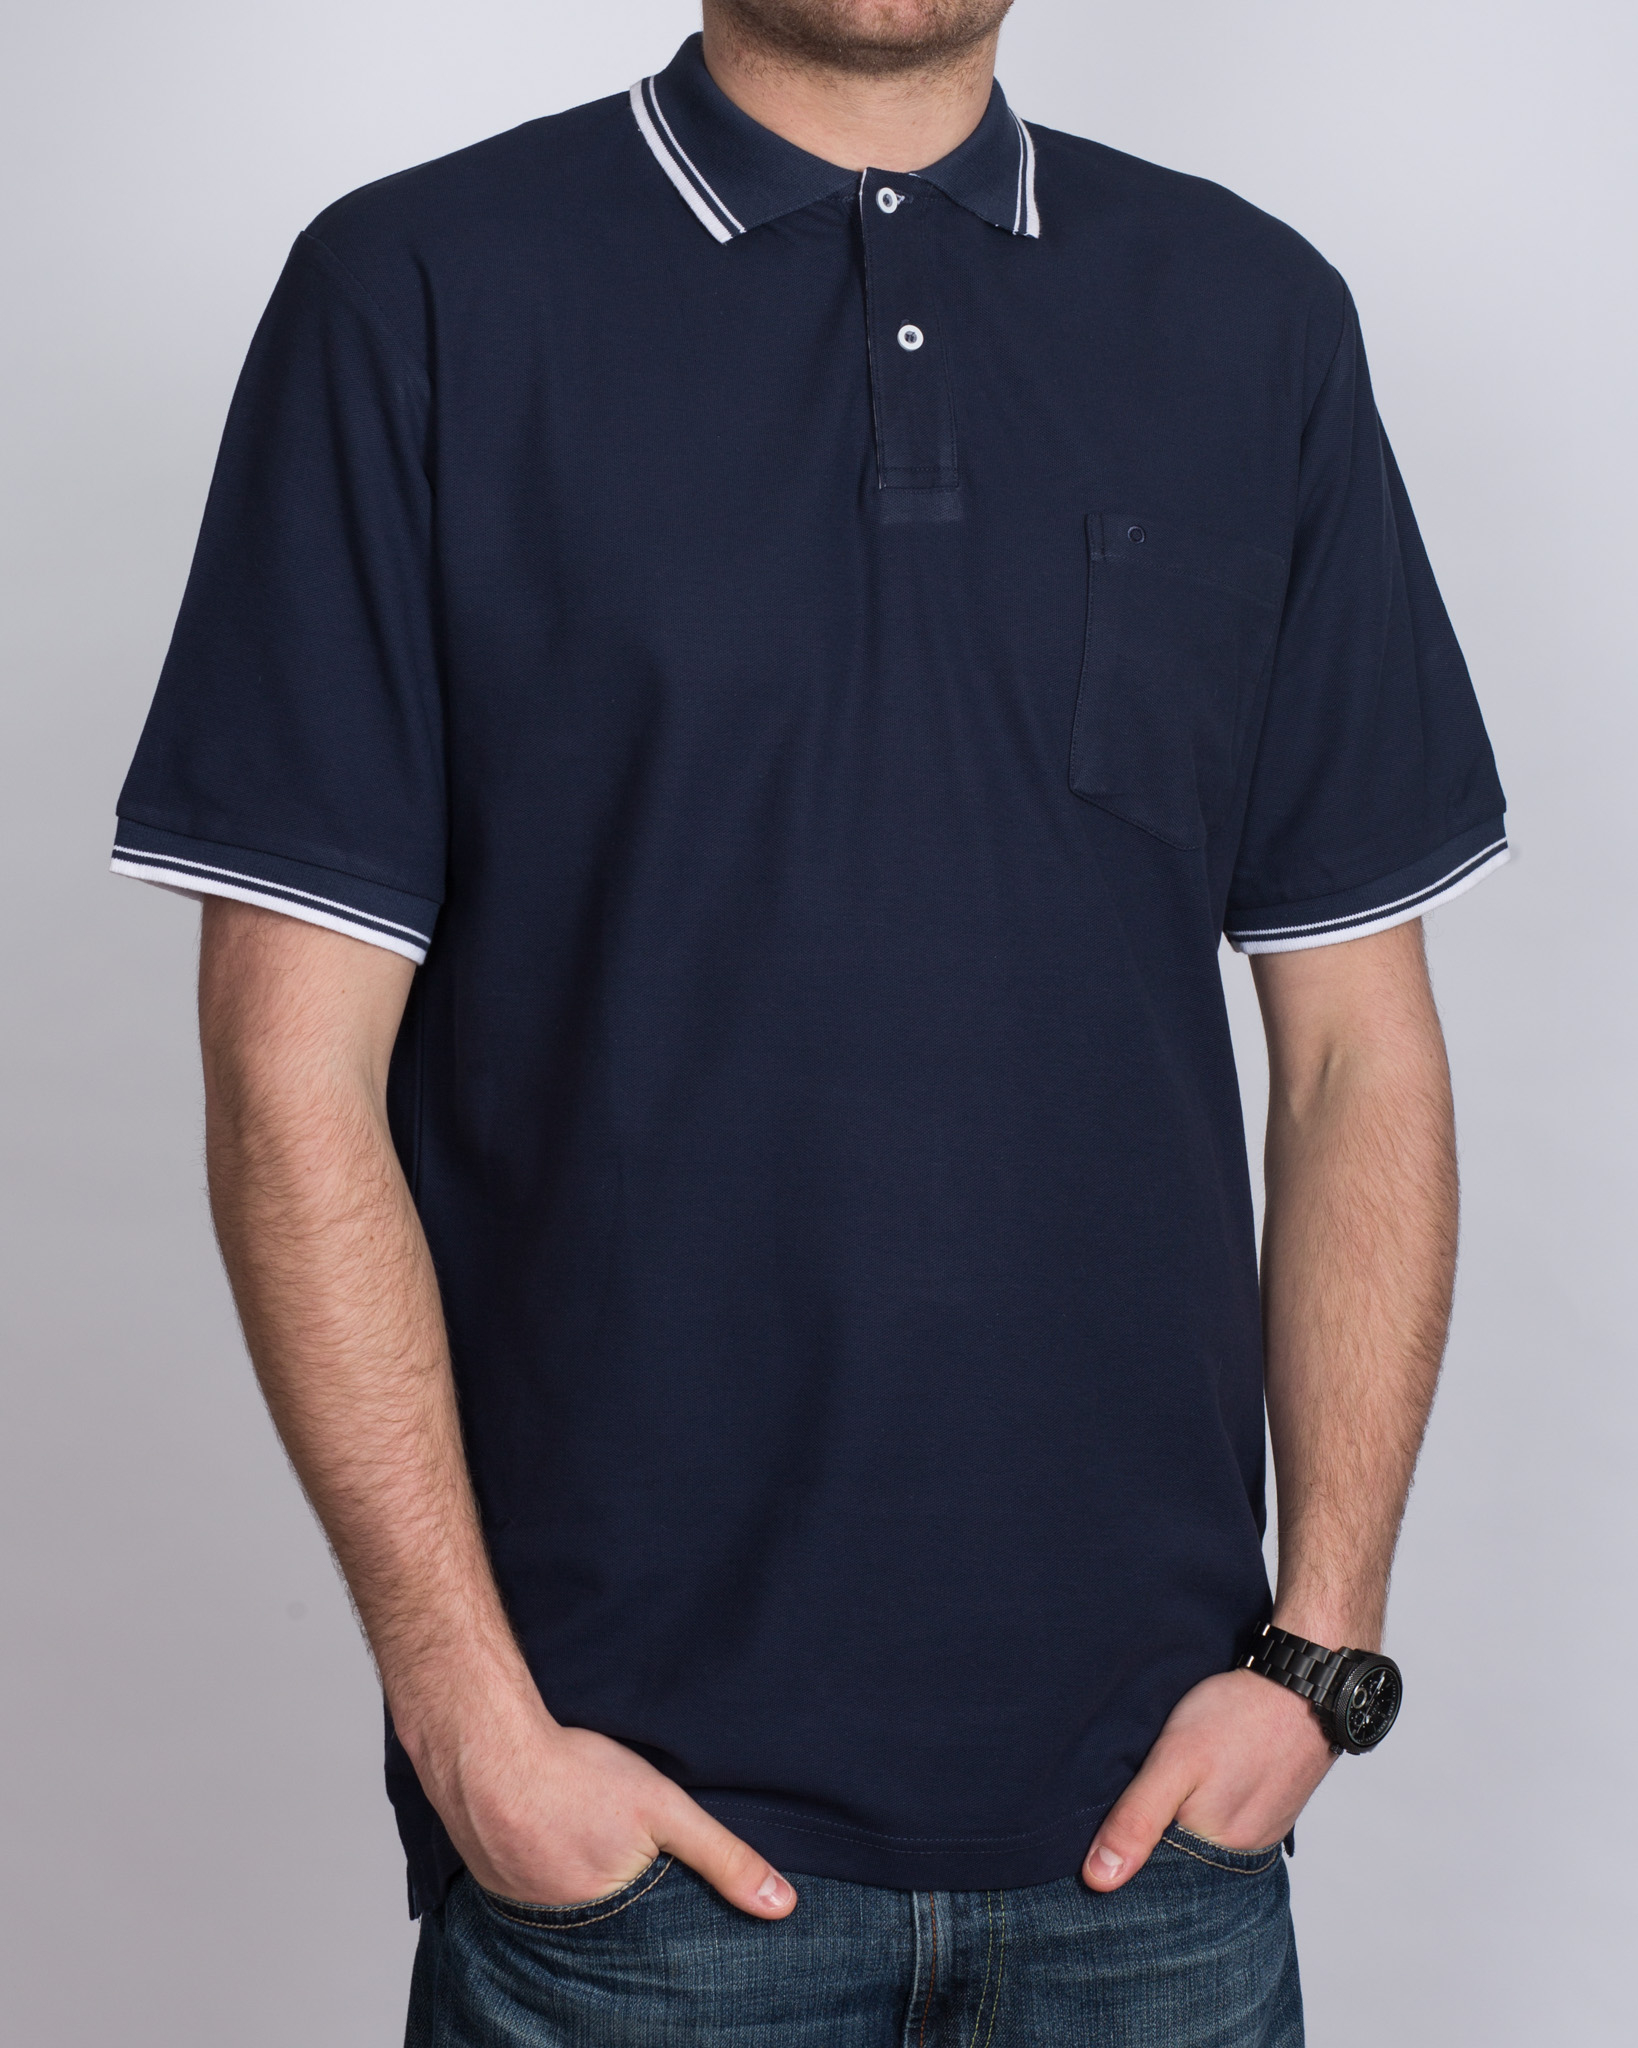 North 56 Tall Polo Shirt (navy)